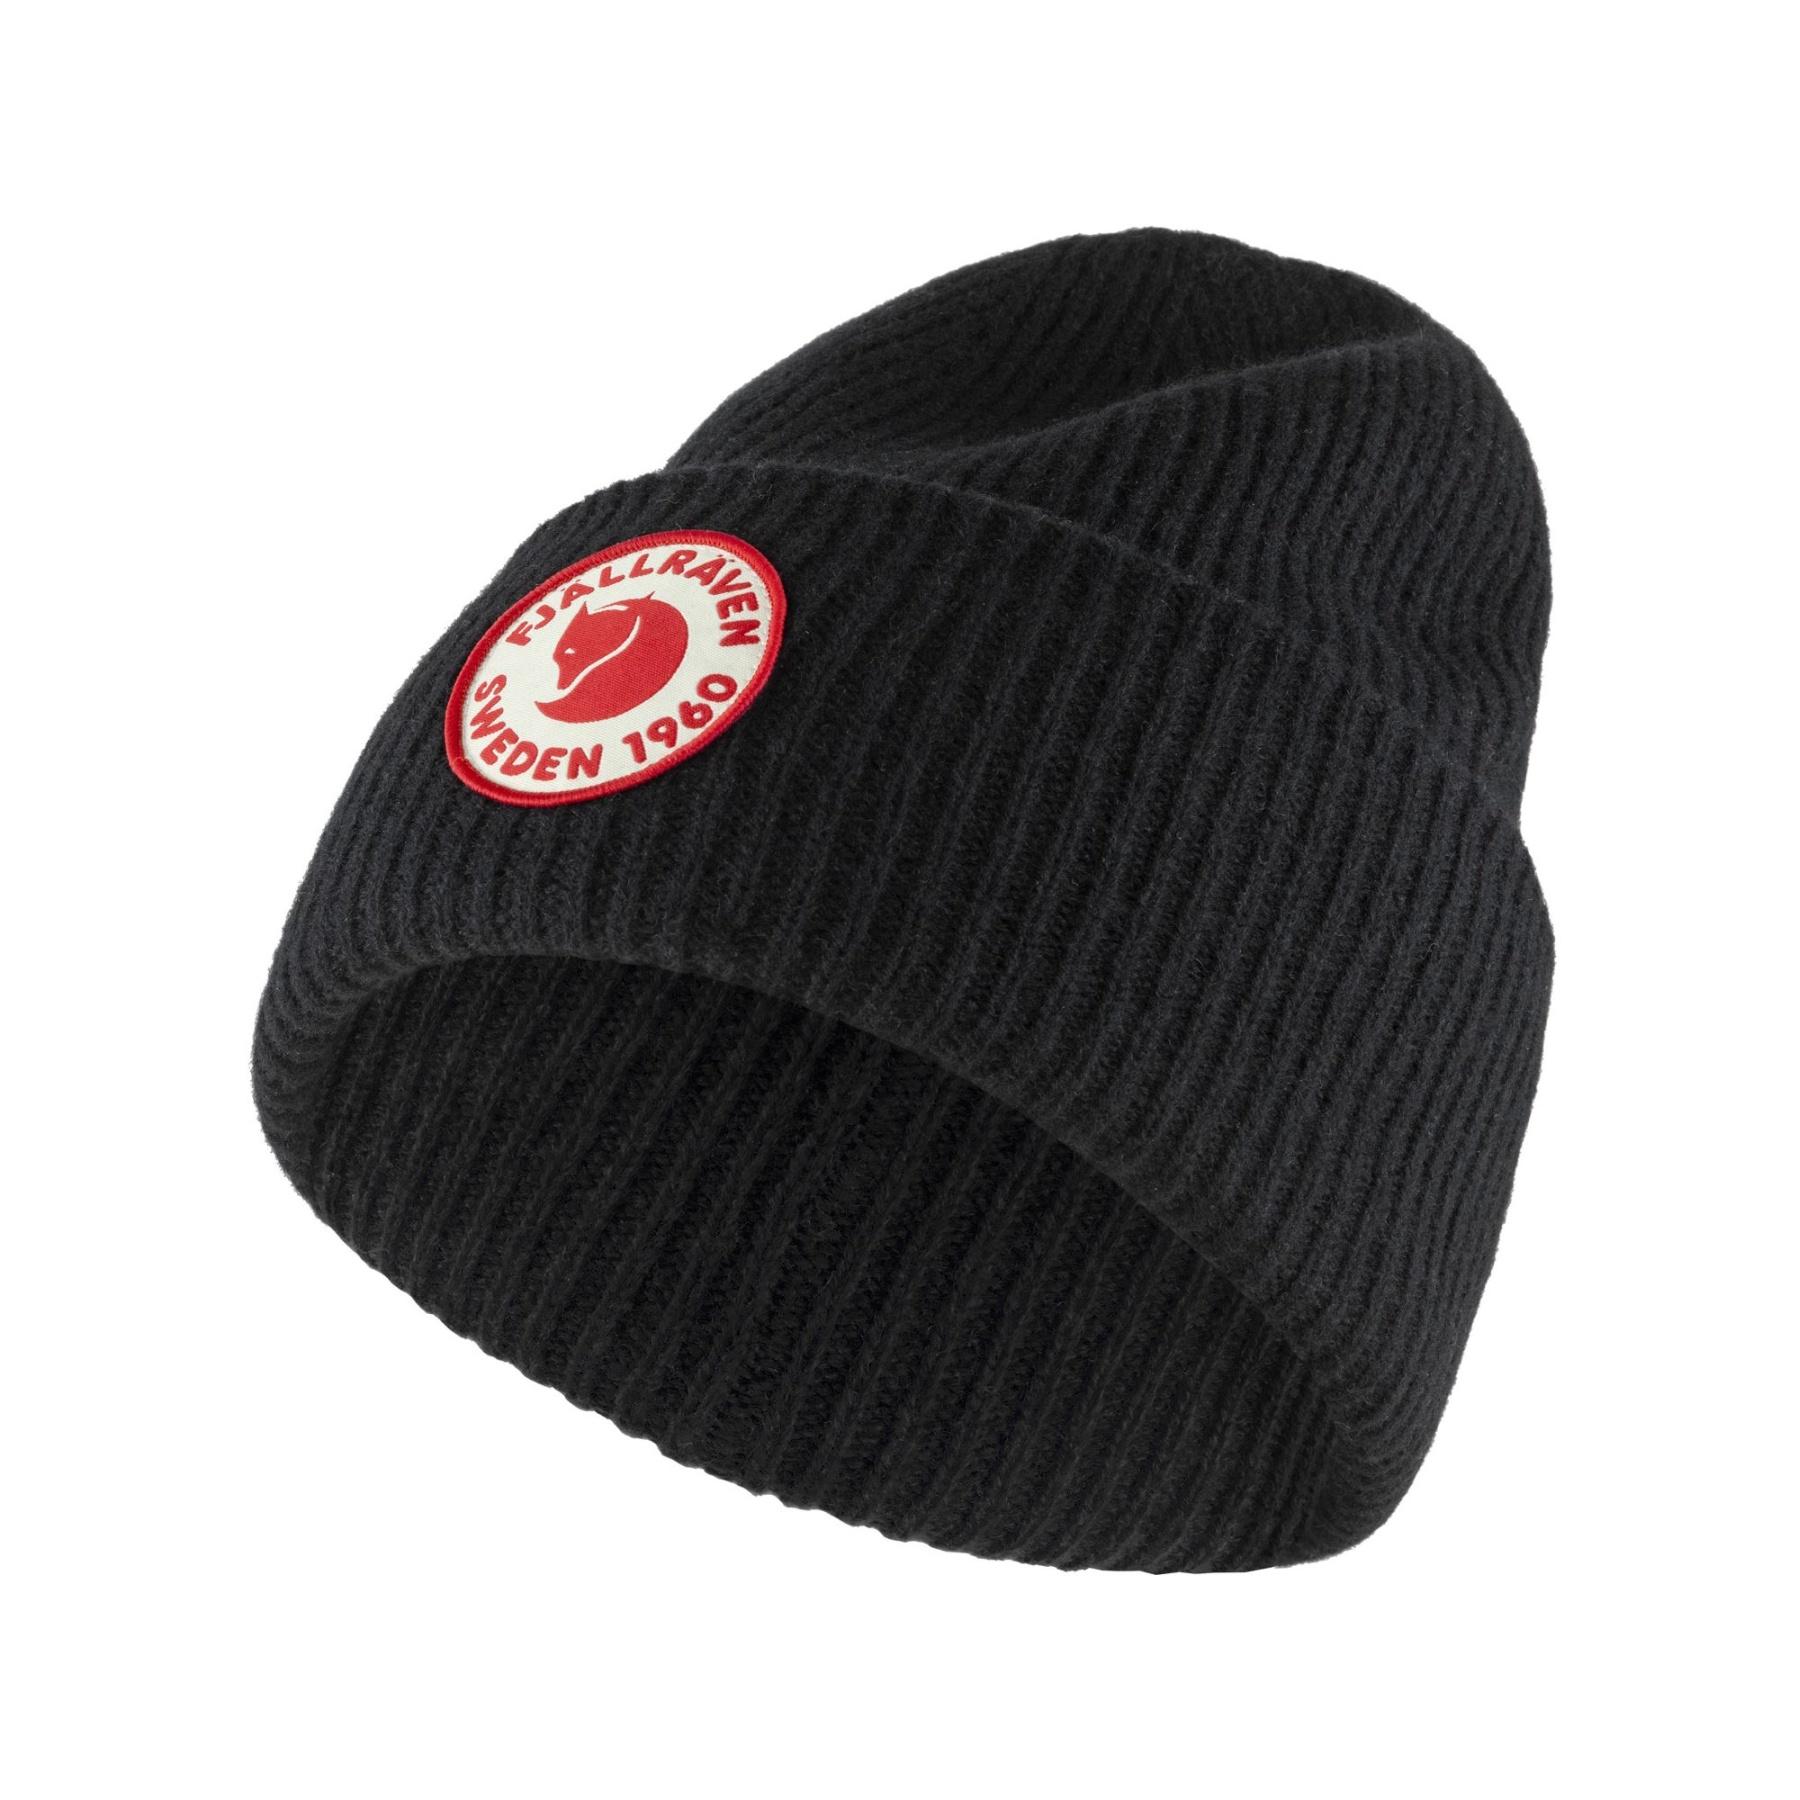 Picture of Fjällräven 1960 Logo Hat - black